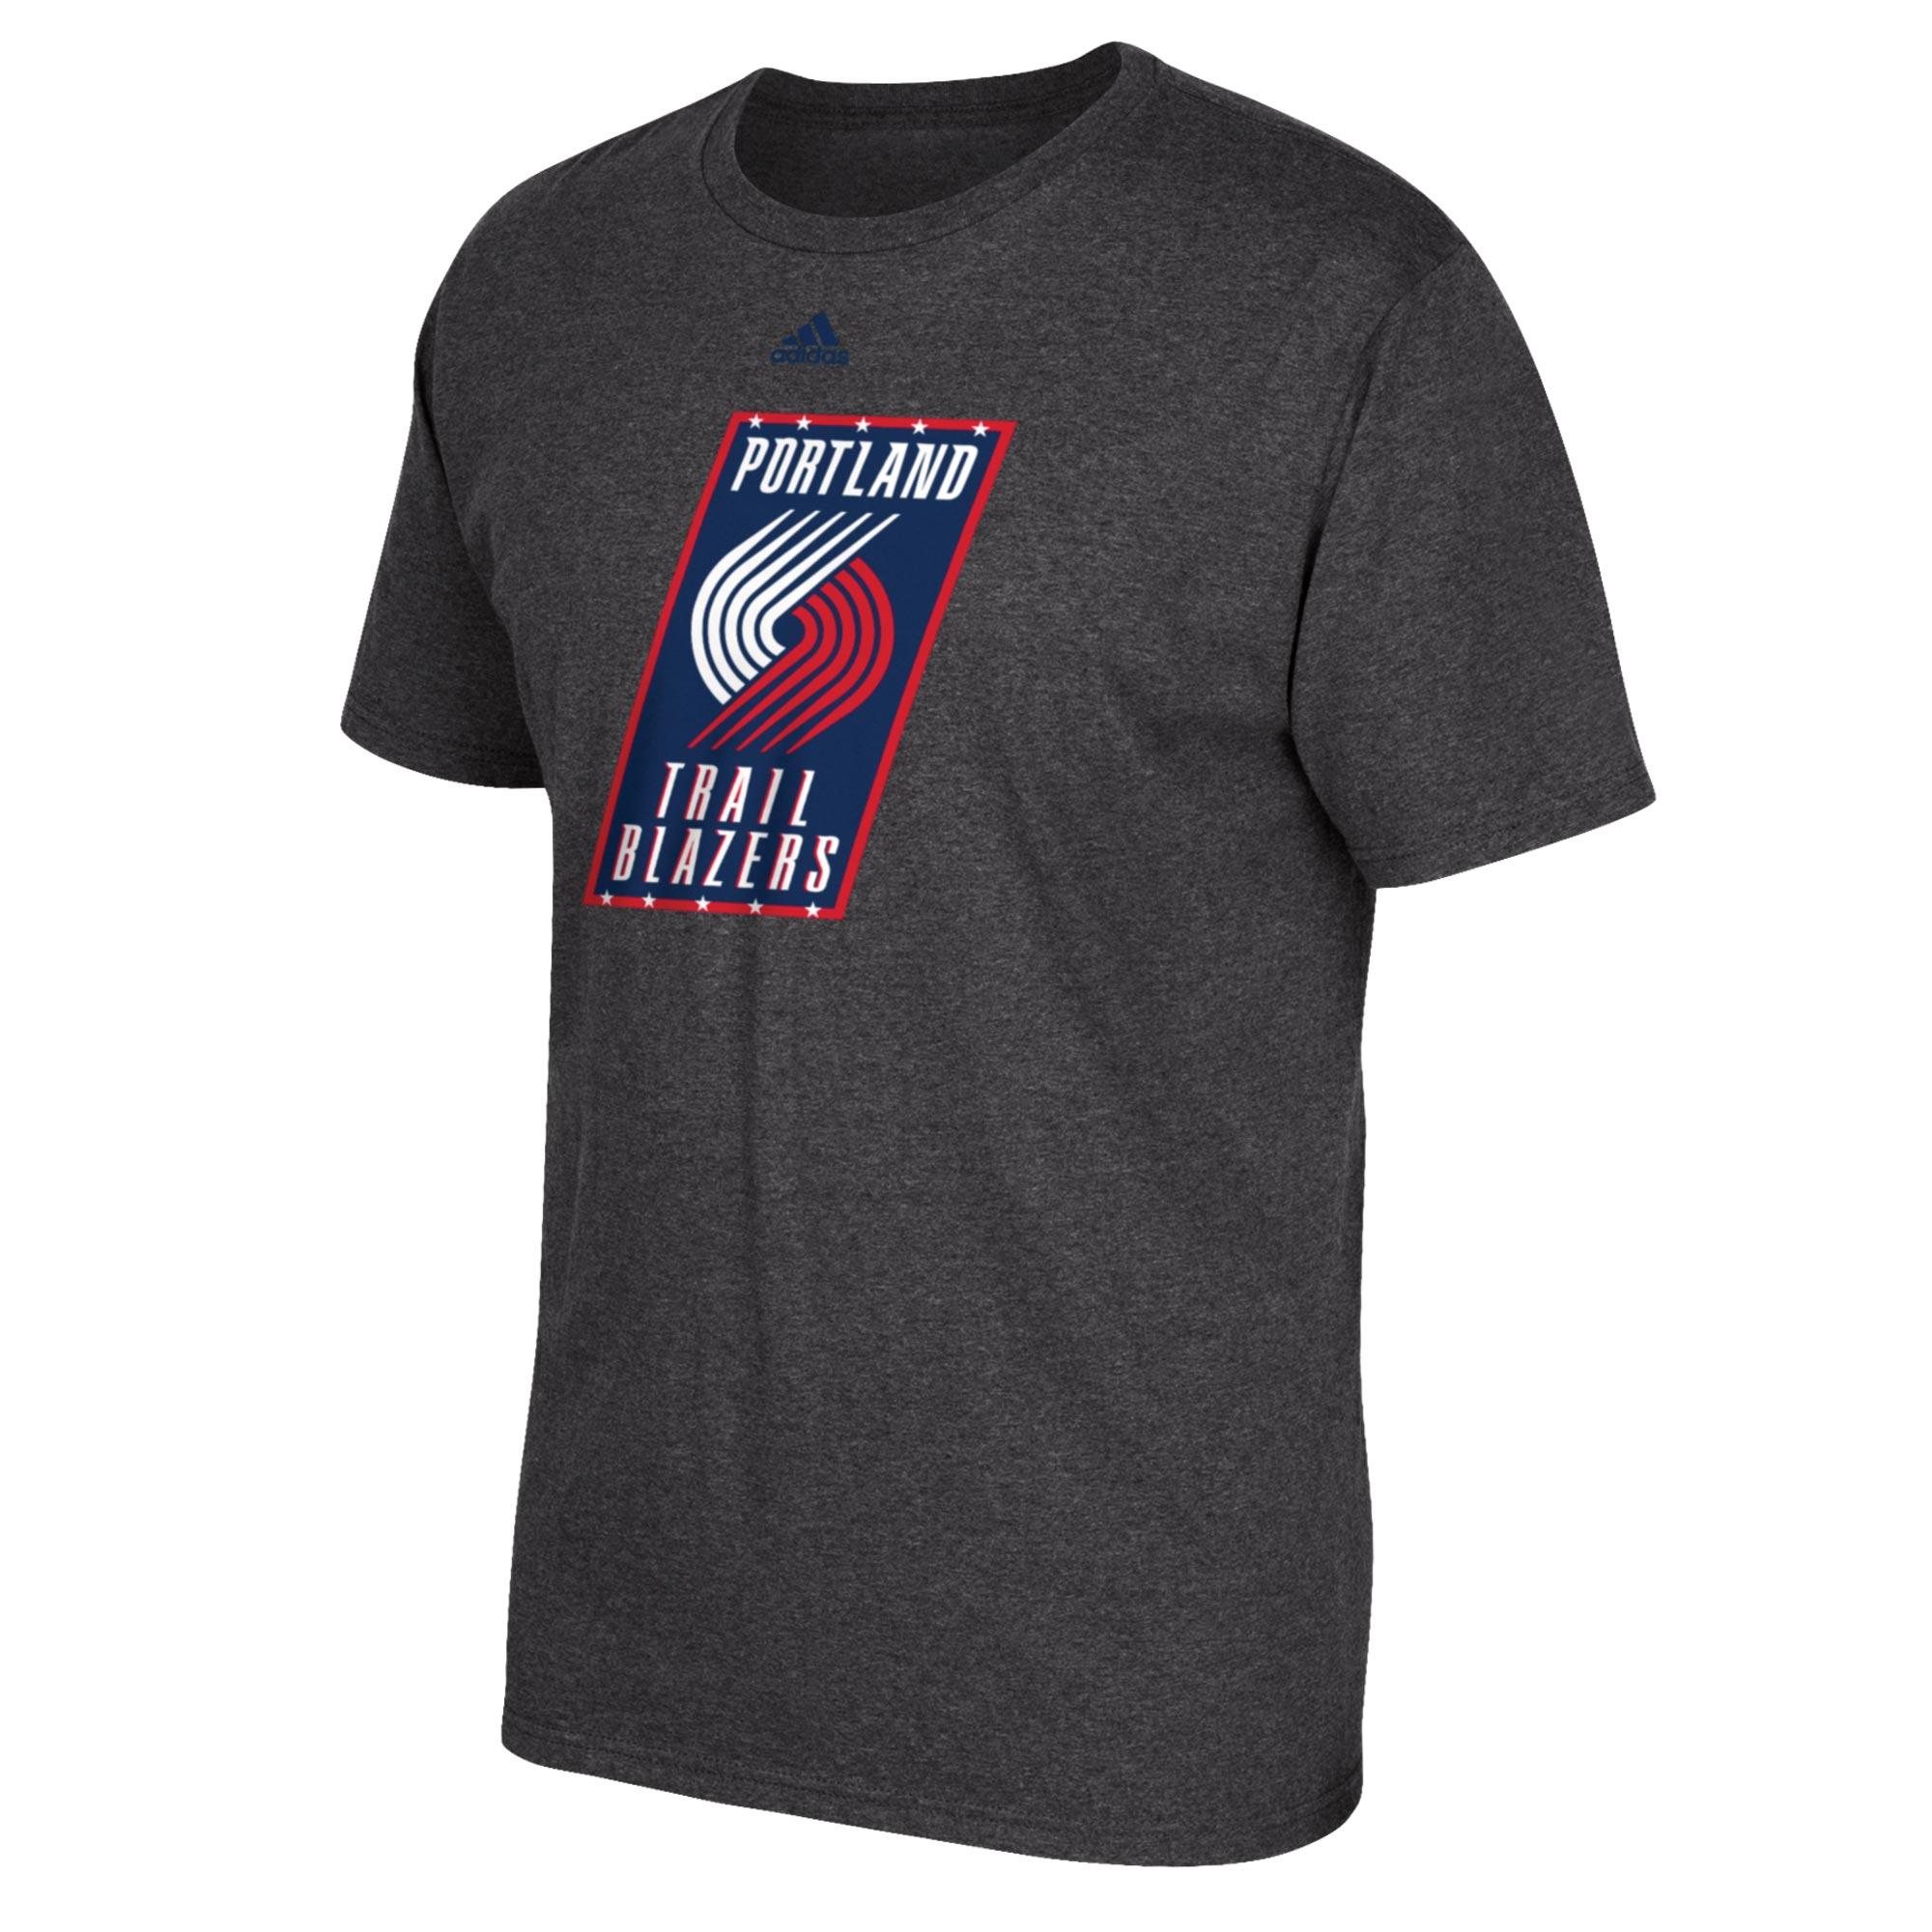 Portland Trail Blazers adidas Stars & Stripes T-Shirt - Mens